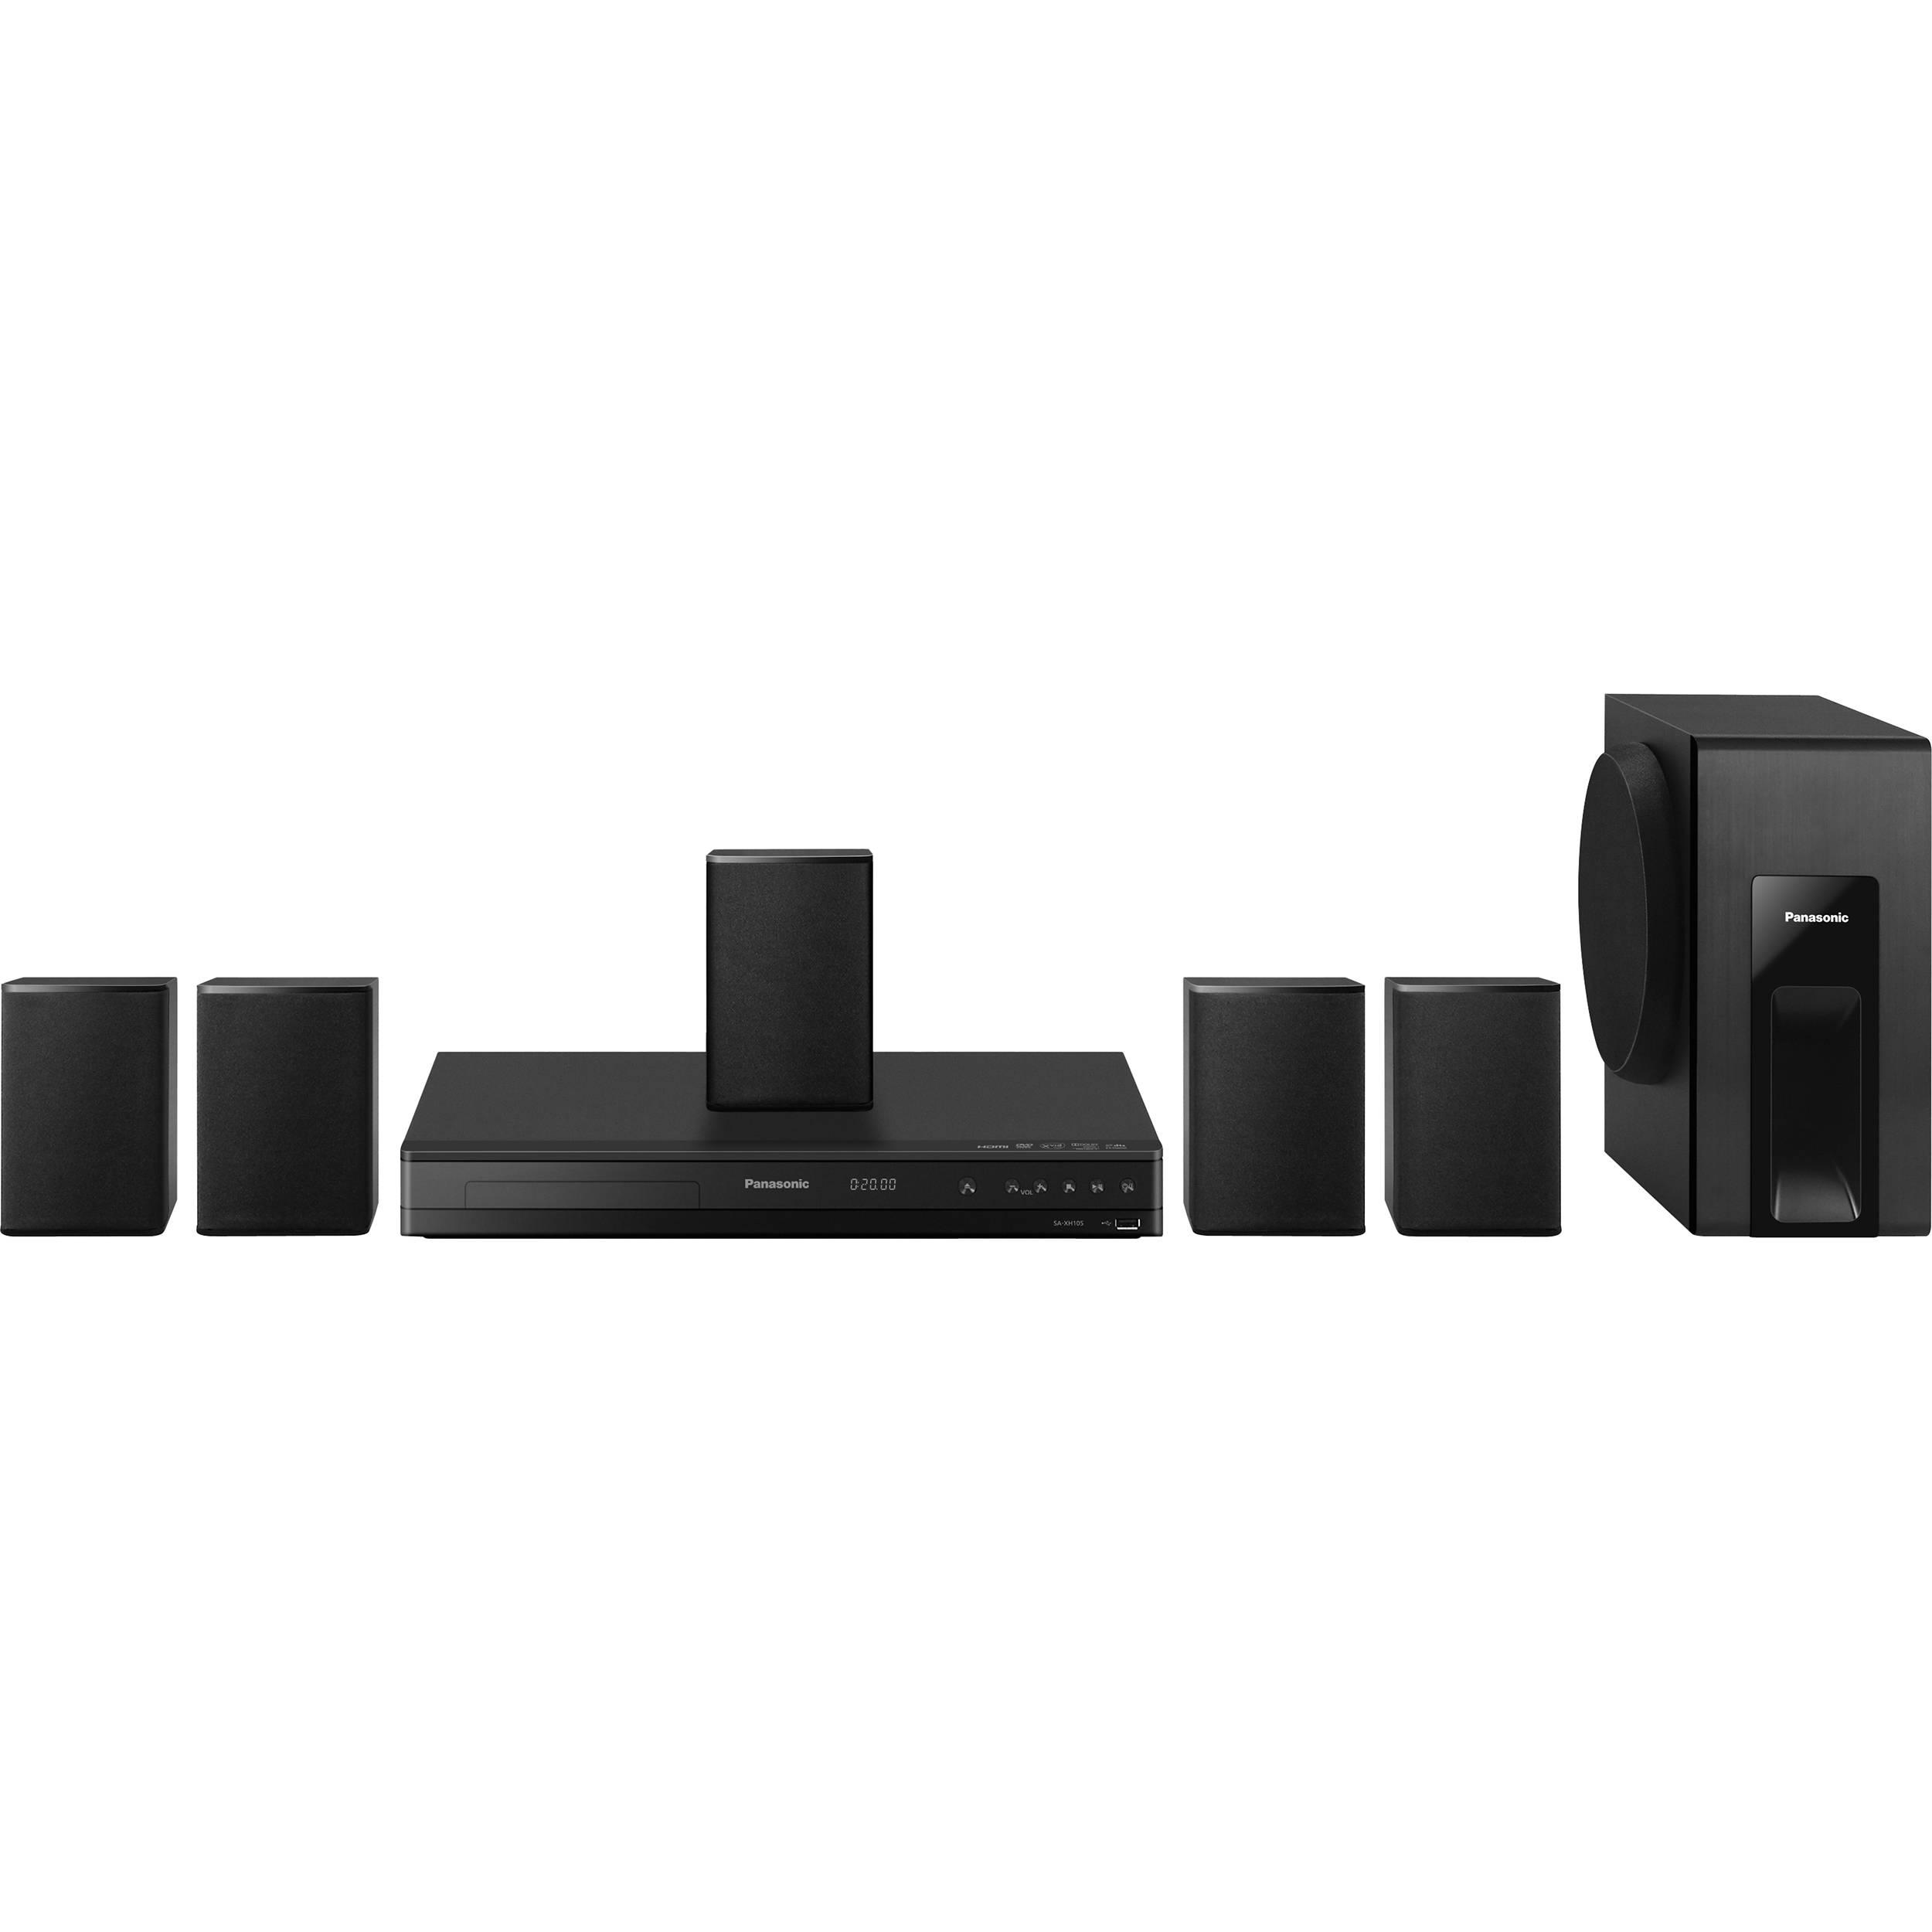 Panasonic sc xh105 dvd home theater sound system sc xh105 b amp h